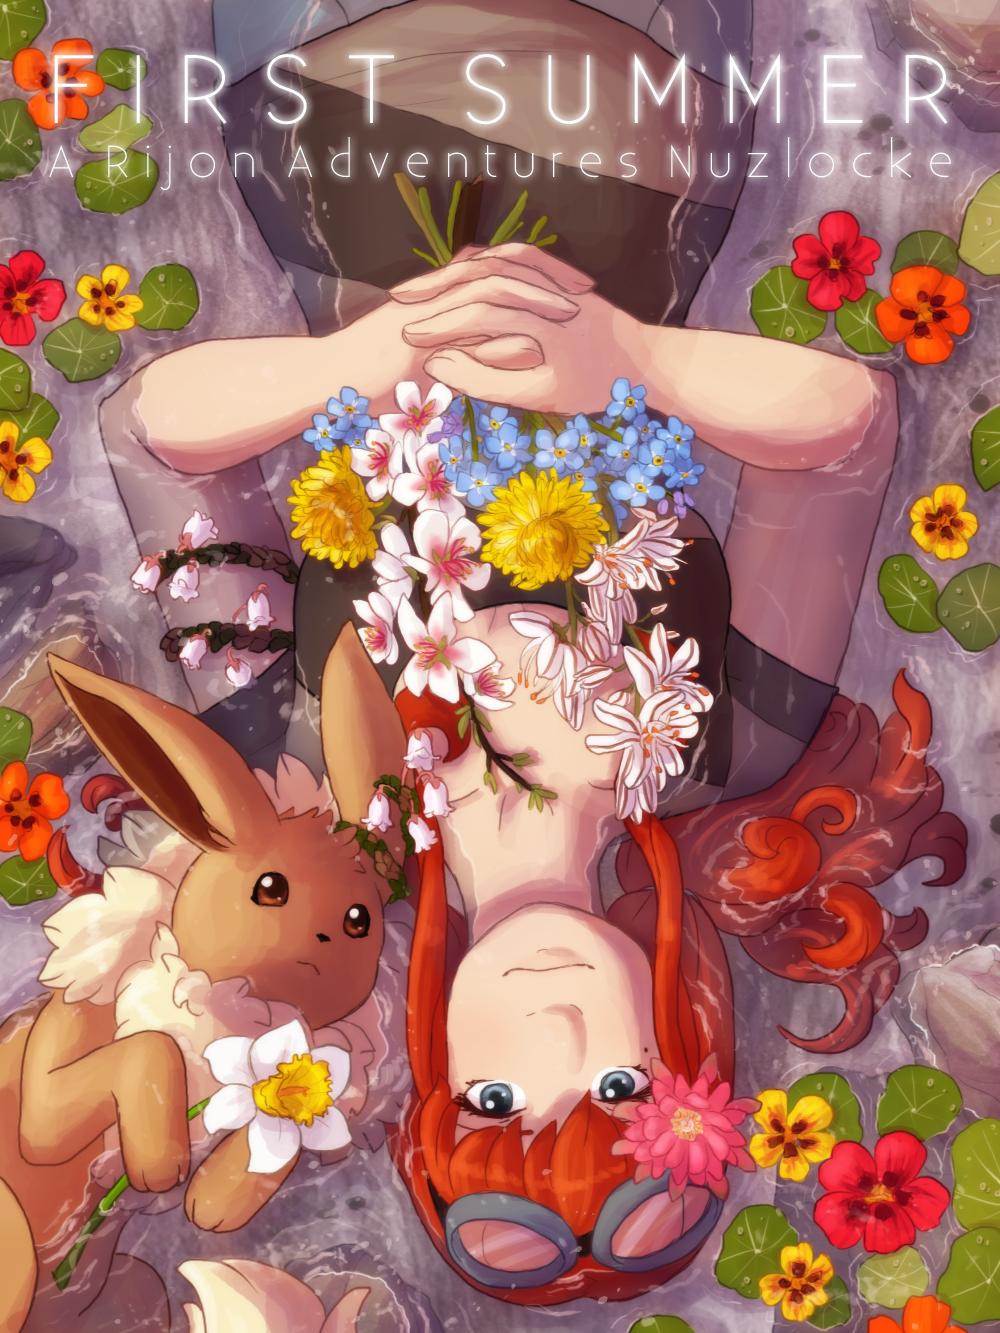 First Summer - A Rijon Adventures Nuzlocke [Cover]